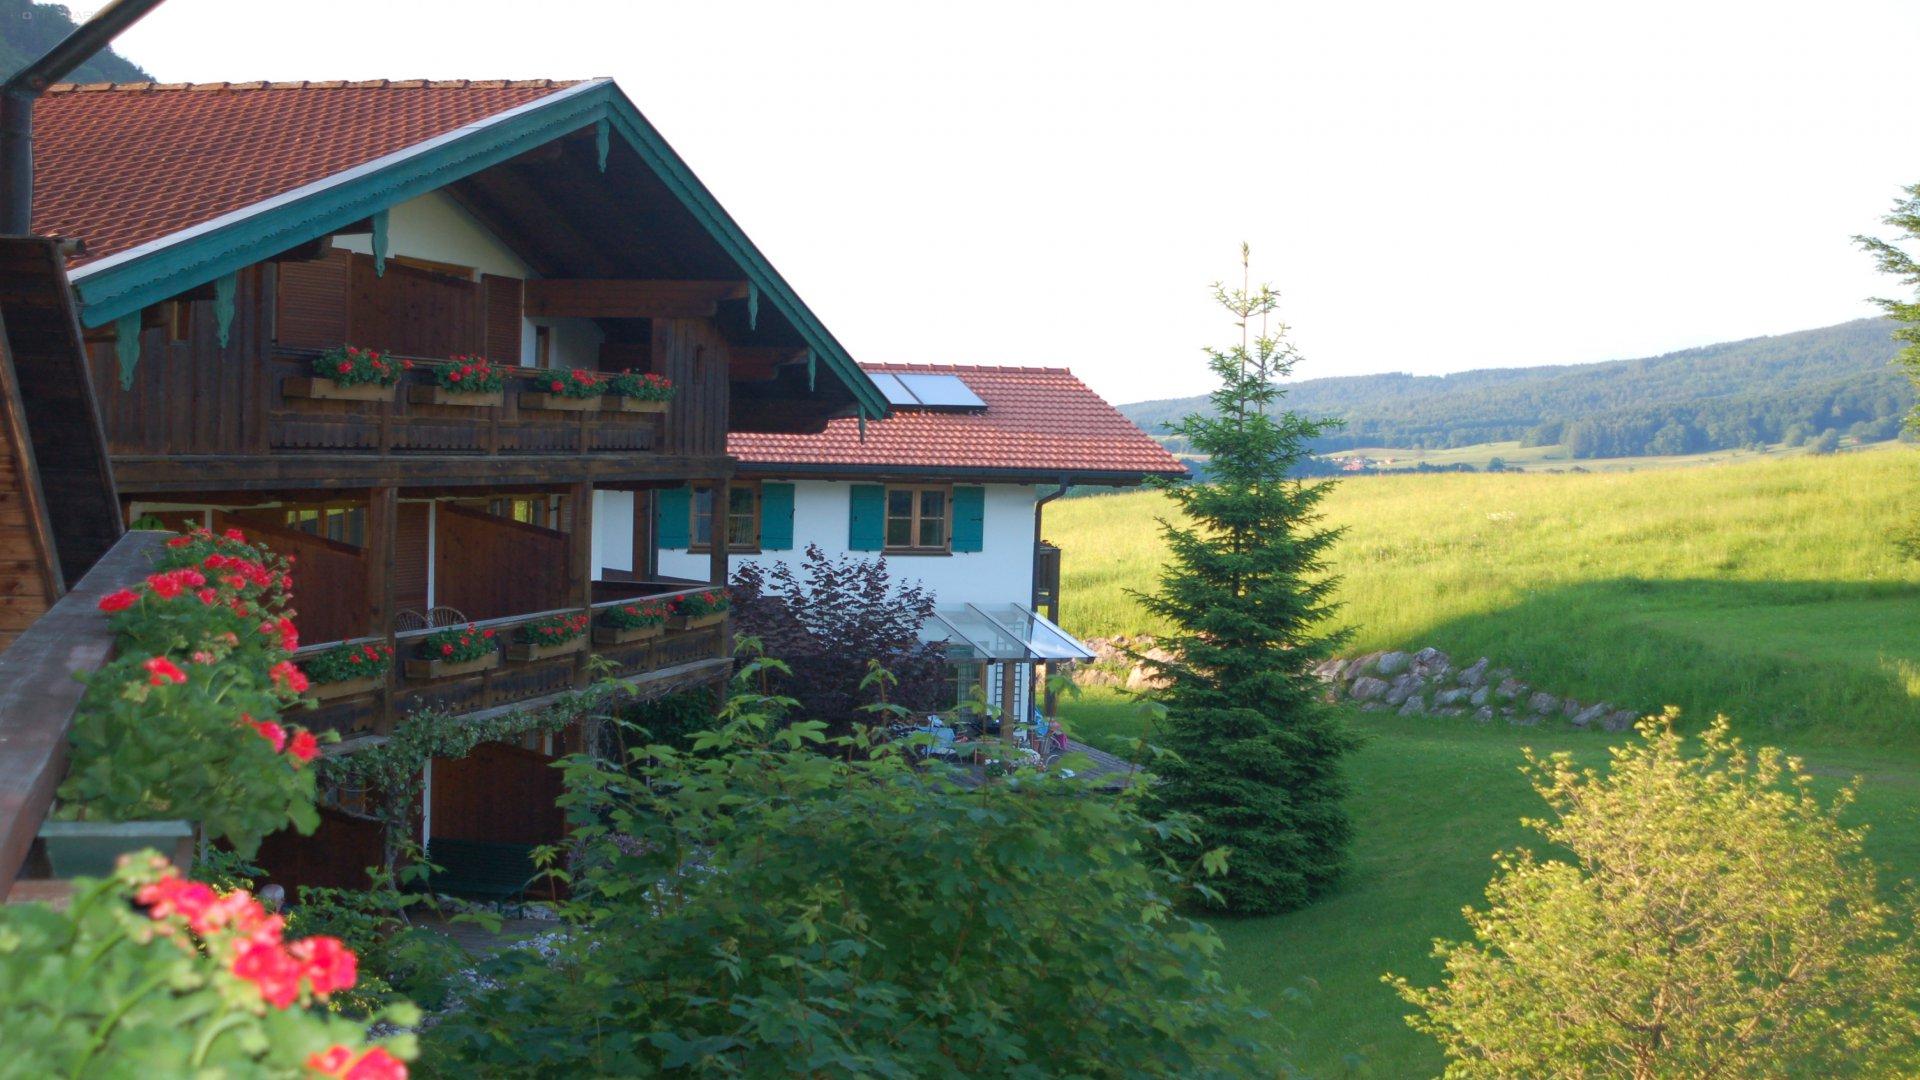 Landhotel Maiergschwendt by DEVA 1